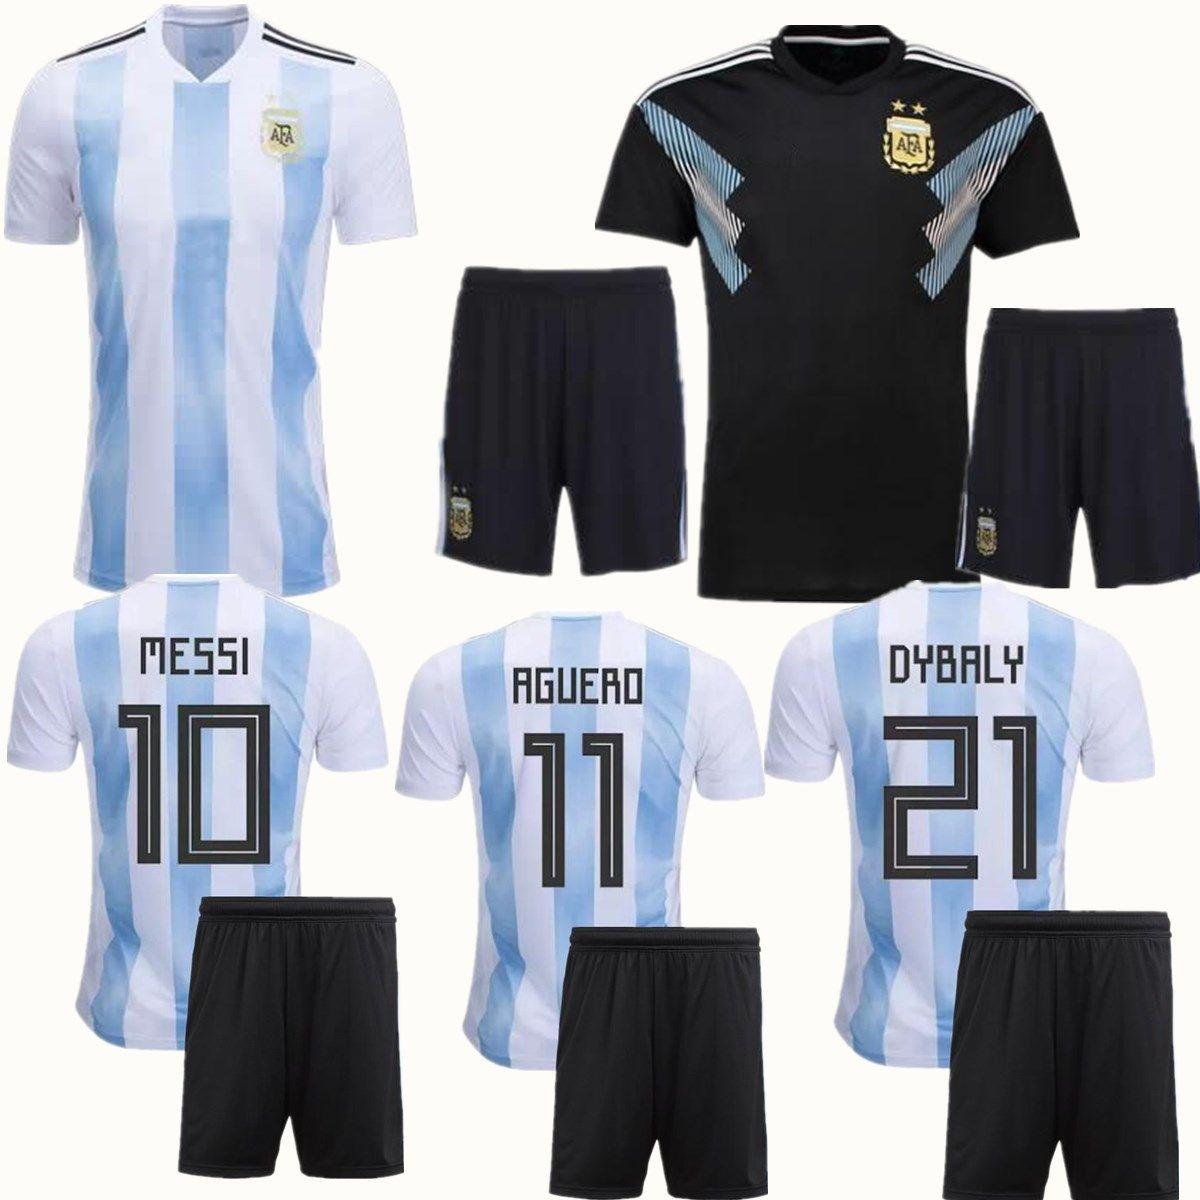 Compre Copa Del Mundo 2018 Conjuntos De Fútbol De Visitante De Argentina  MESSI DI MARIA AGUERO KOMPANY DYBALA Maillot Negro Equipación De Adultos  Uniforme ... a30cbcb9defe7